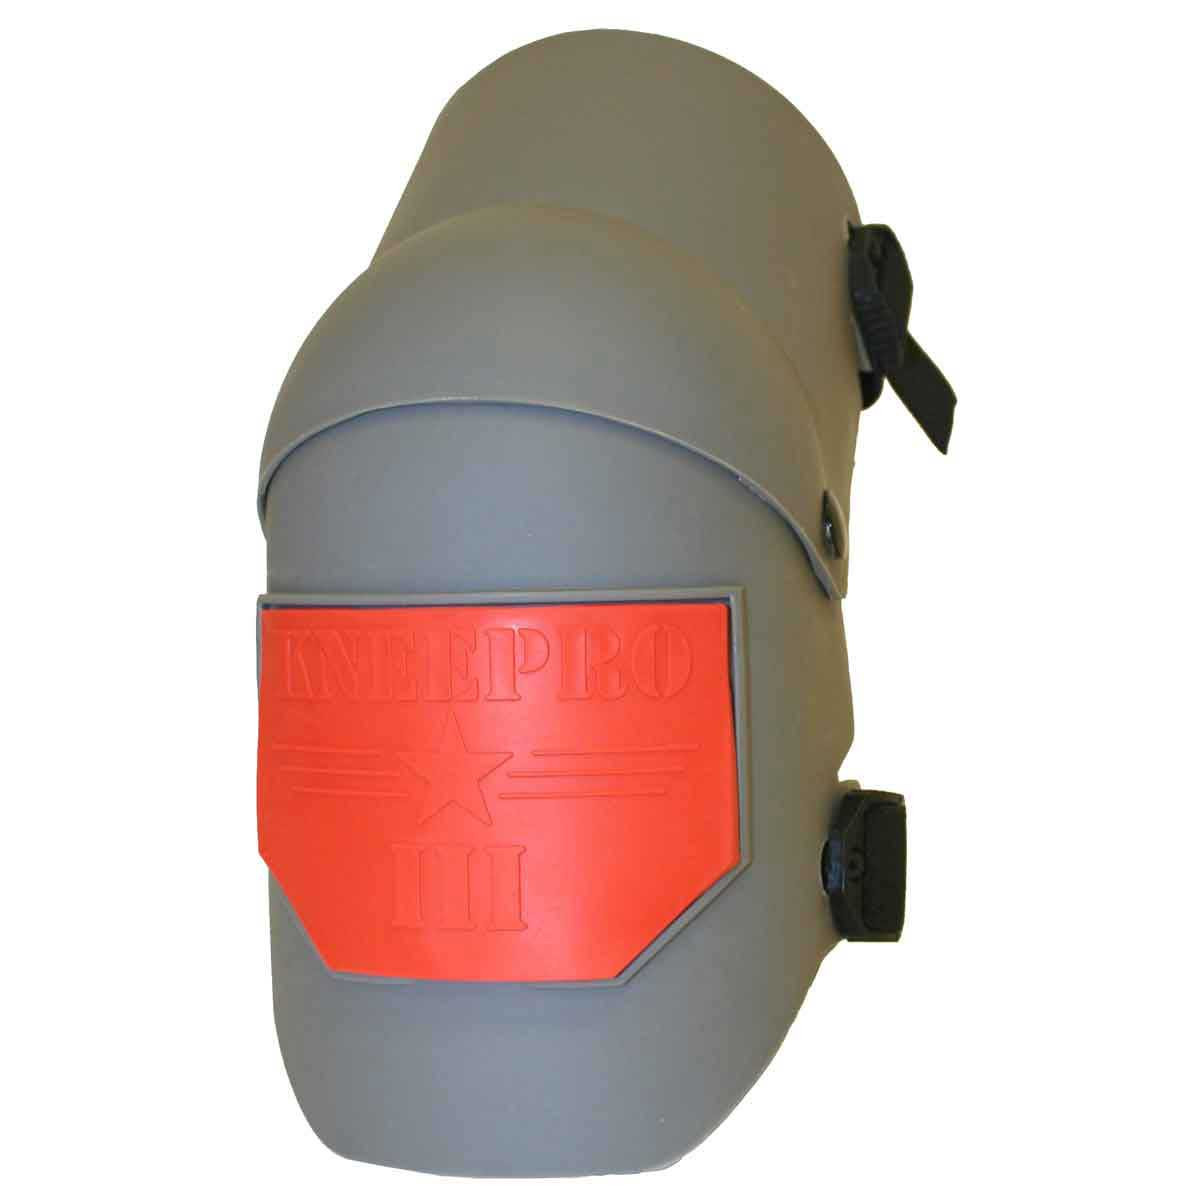 Knee Pro Ultra Flex Knee Pads